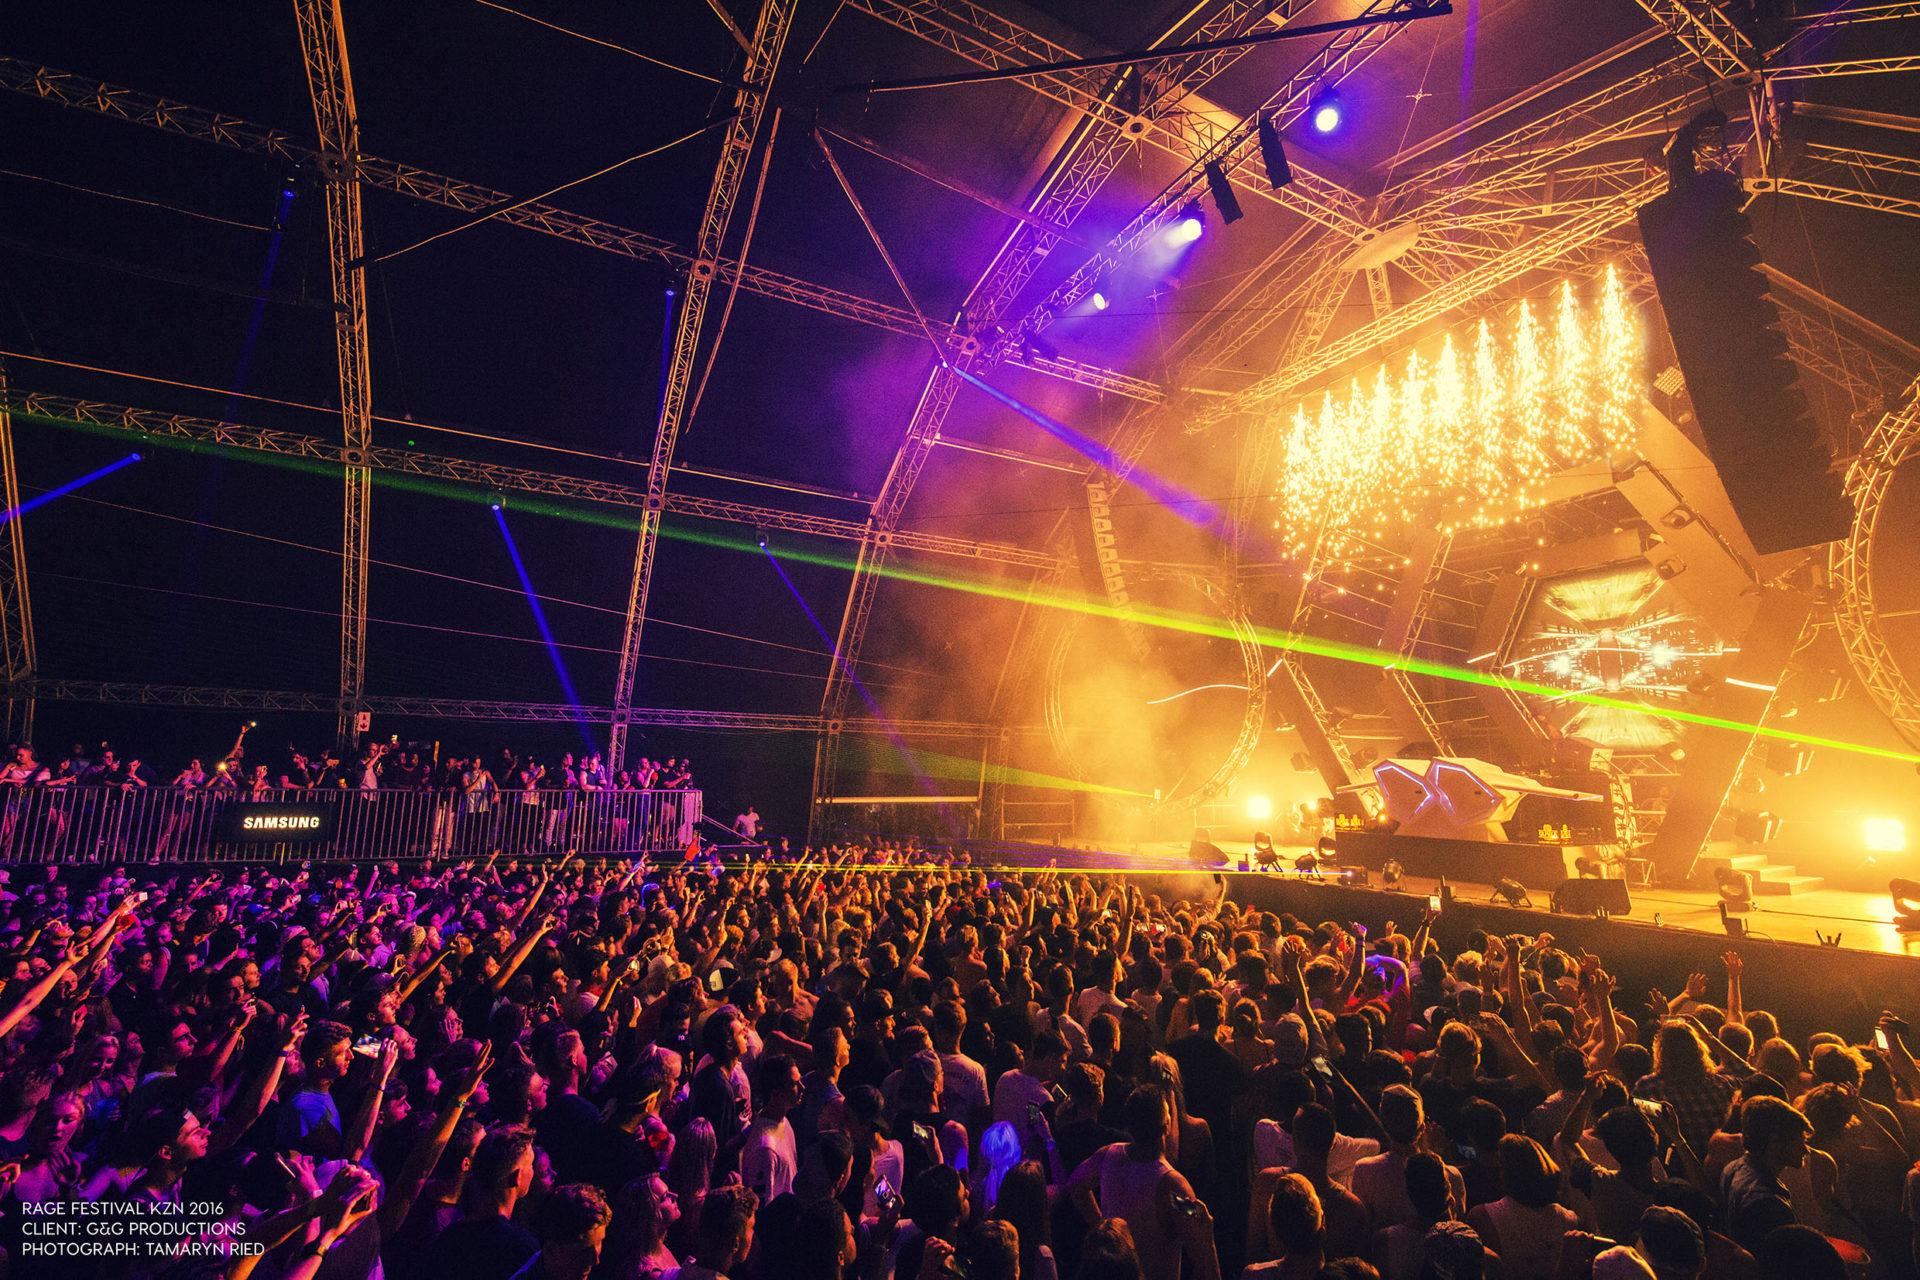 RAGE FESTIVAL 2016